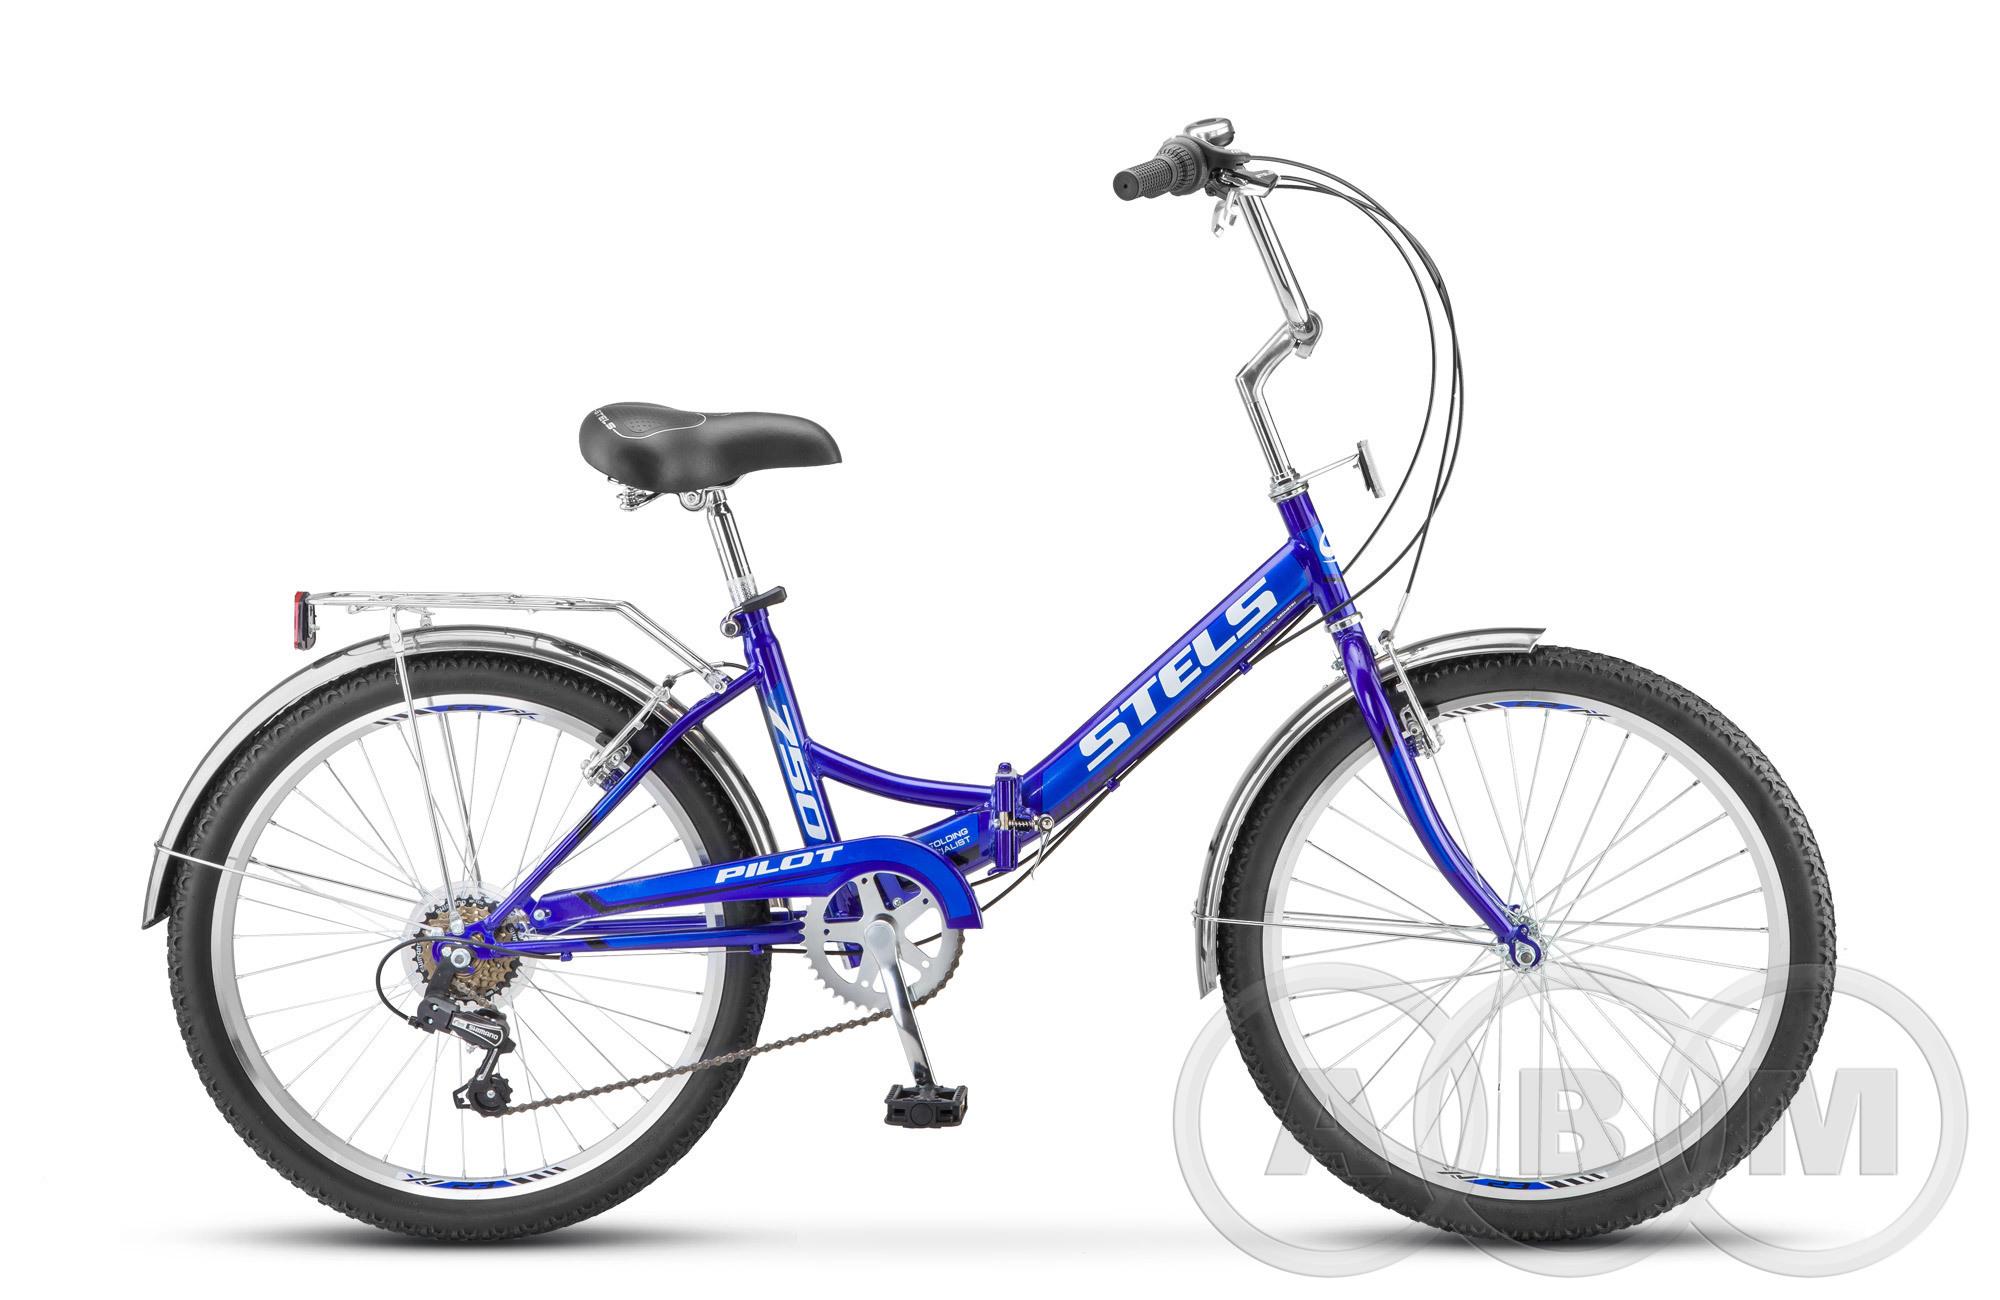 24 Велосипед Stels Pilot-750  1 ск.